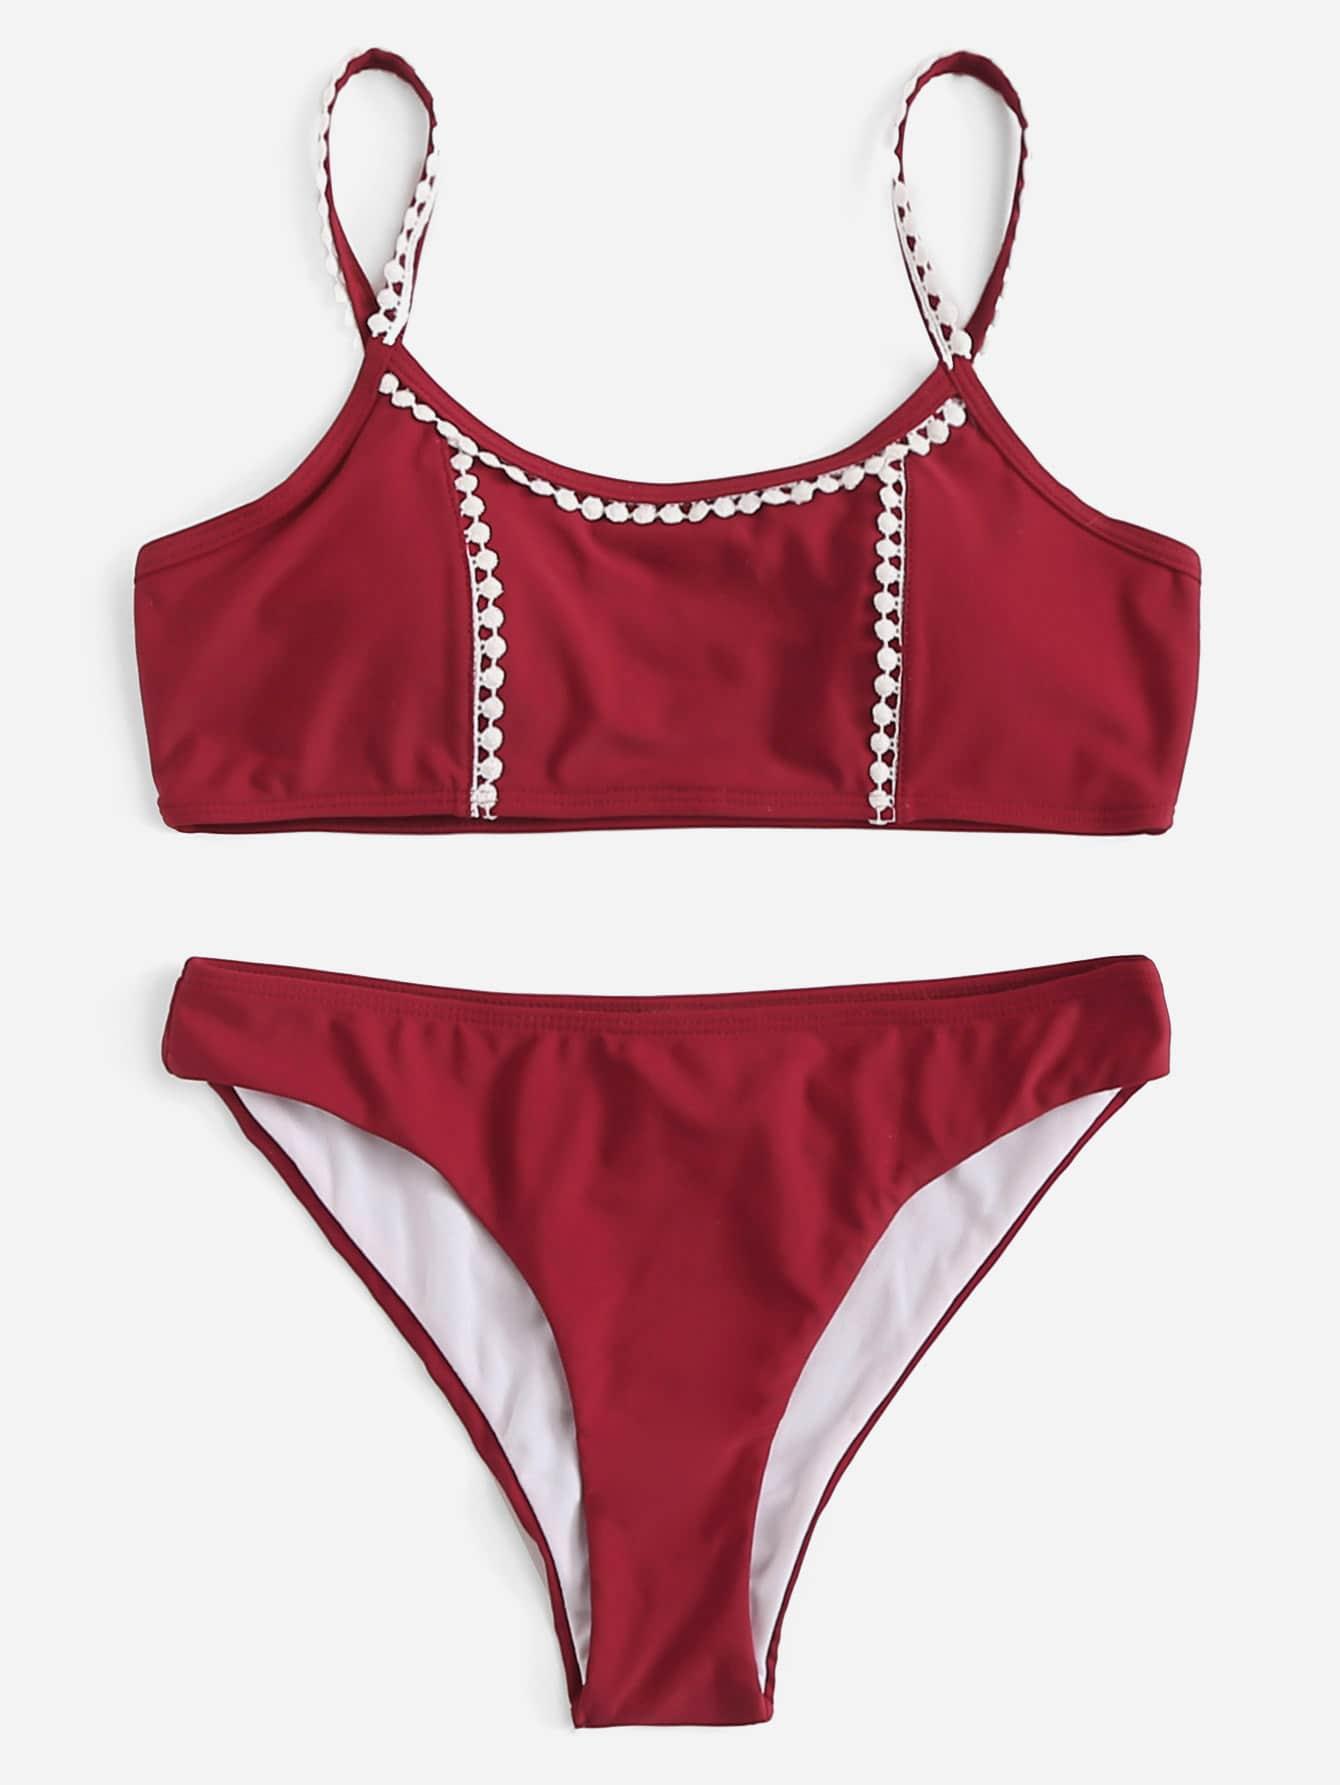 Купить Вязание крючком Trim Bikini Set, null, SheIn